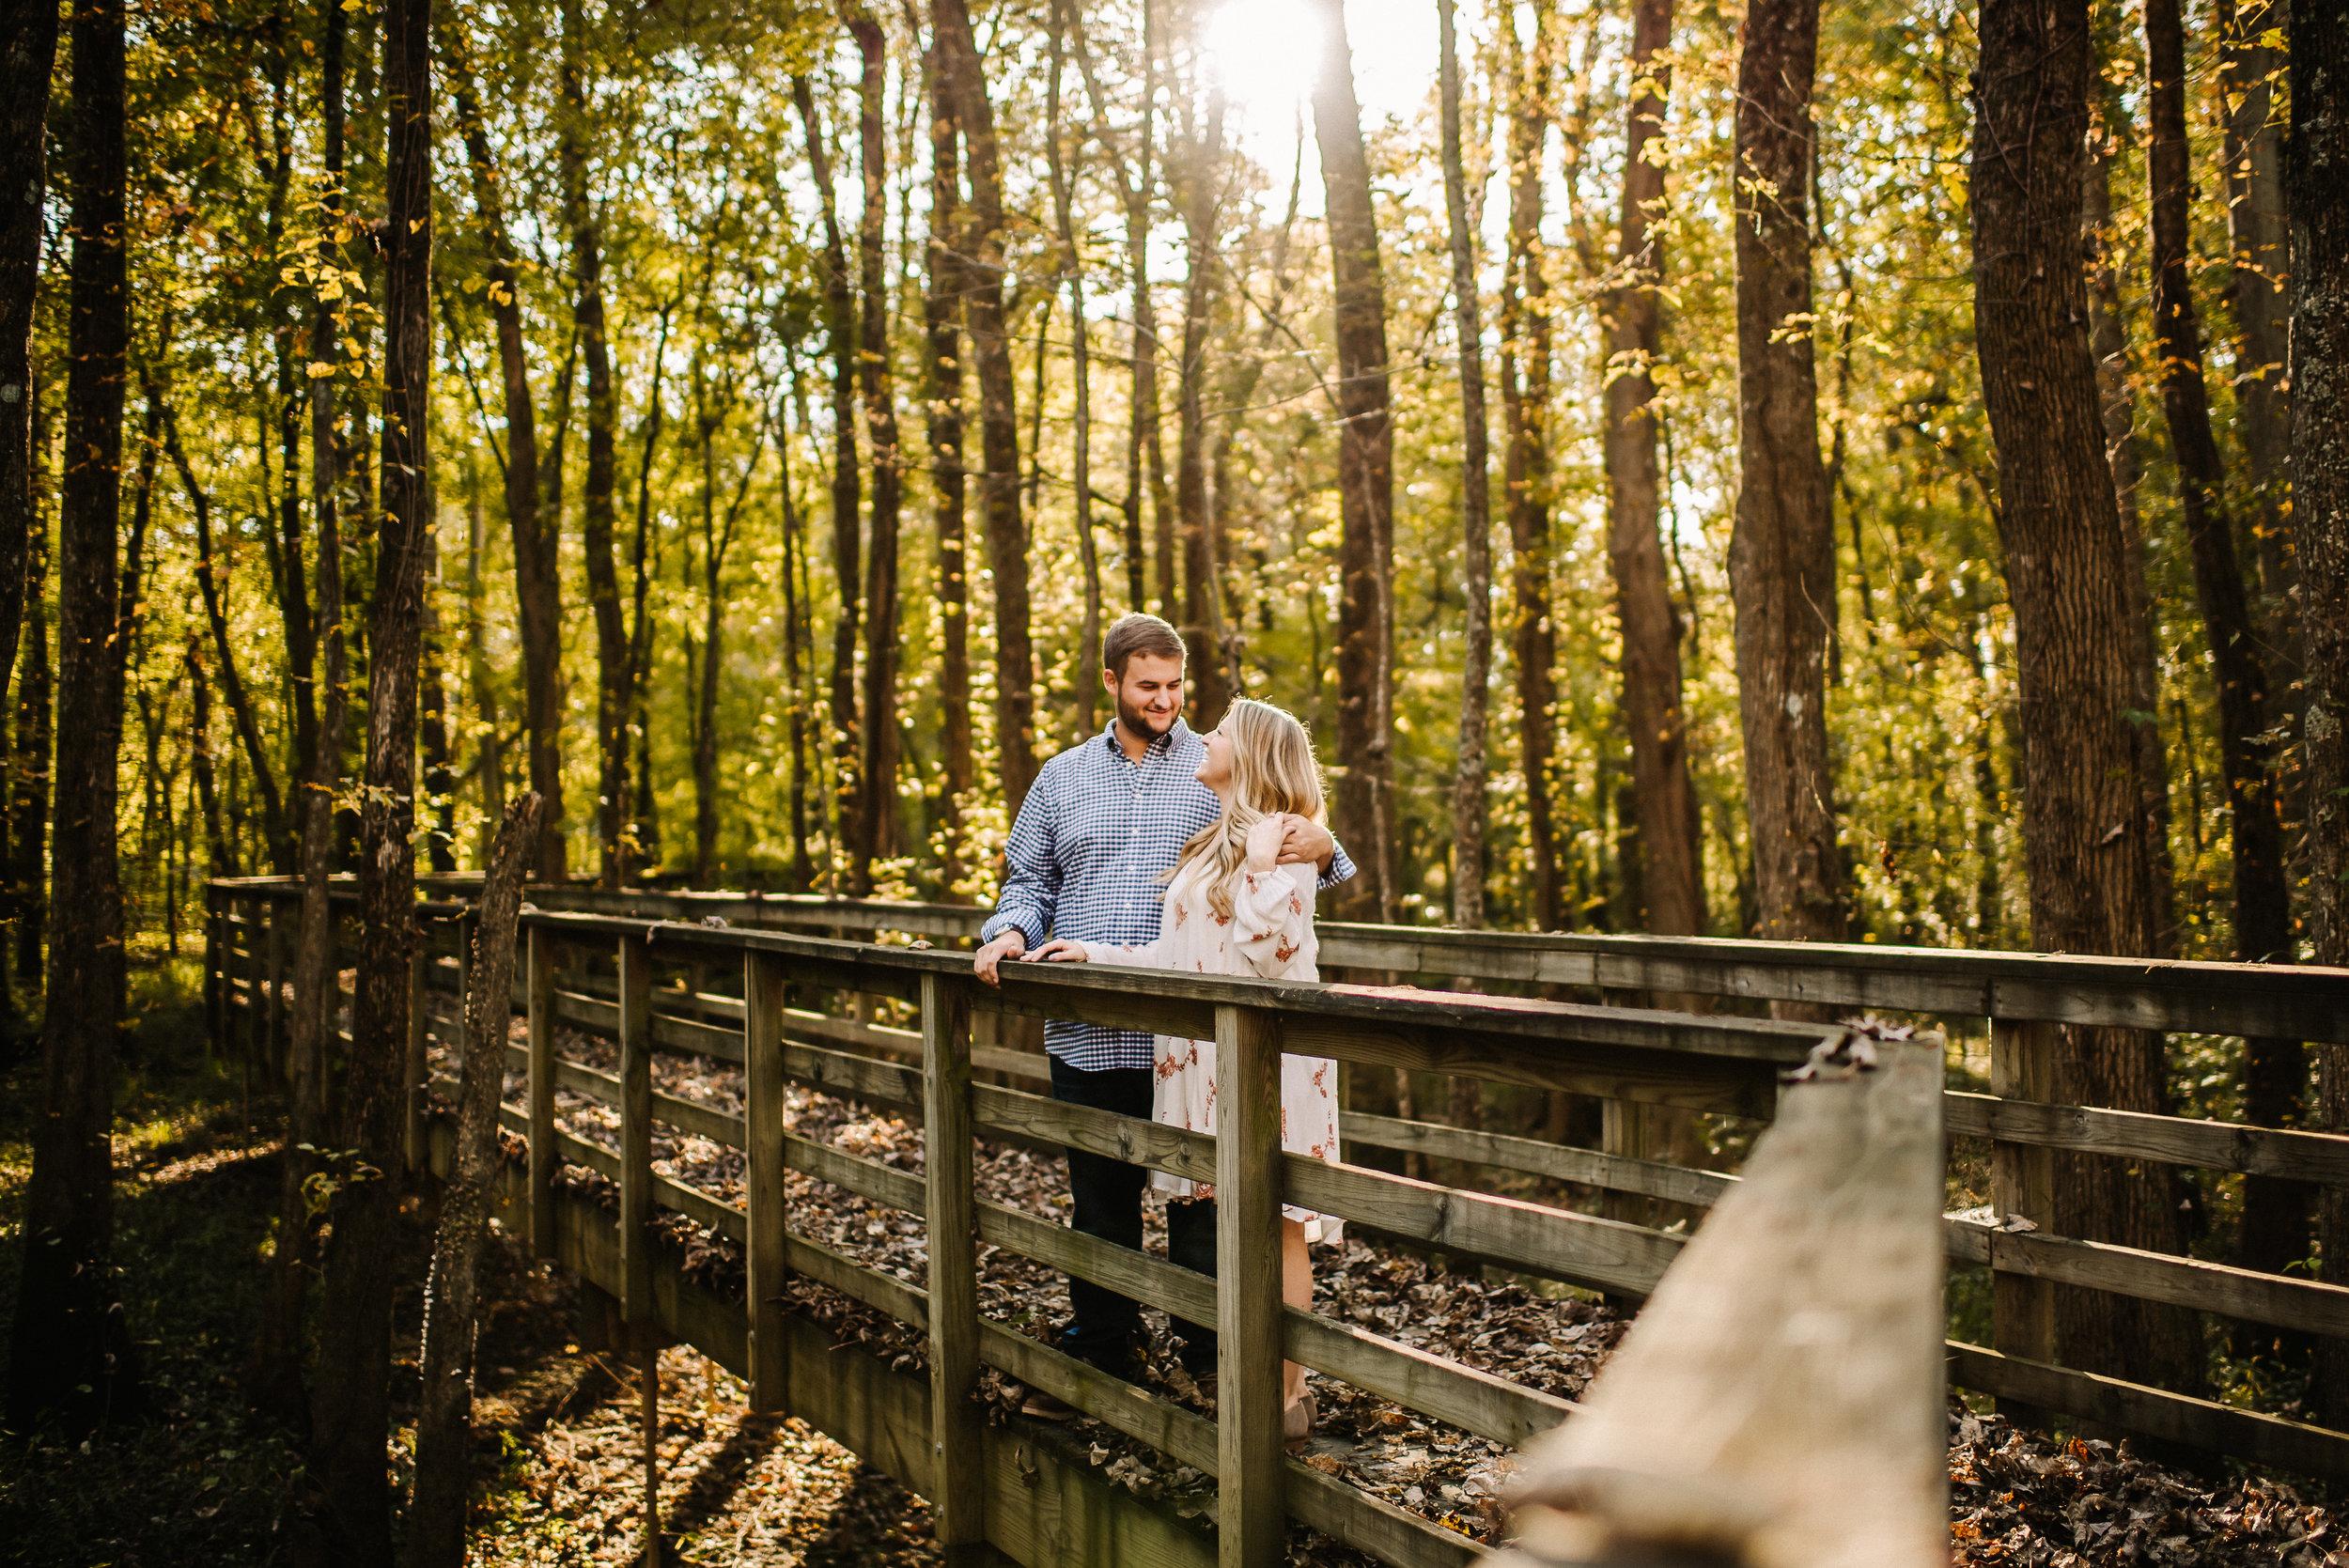 Romantic Fall Engagement Photography_Alexis & Jacob_Ashley Benham Photography-35.jpg